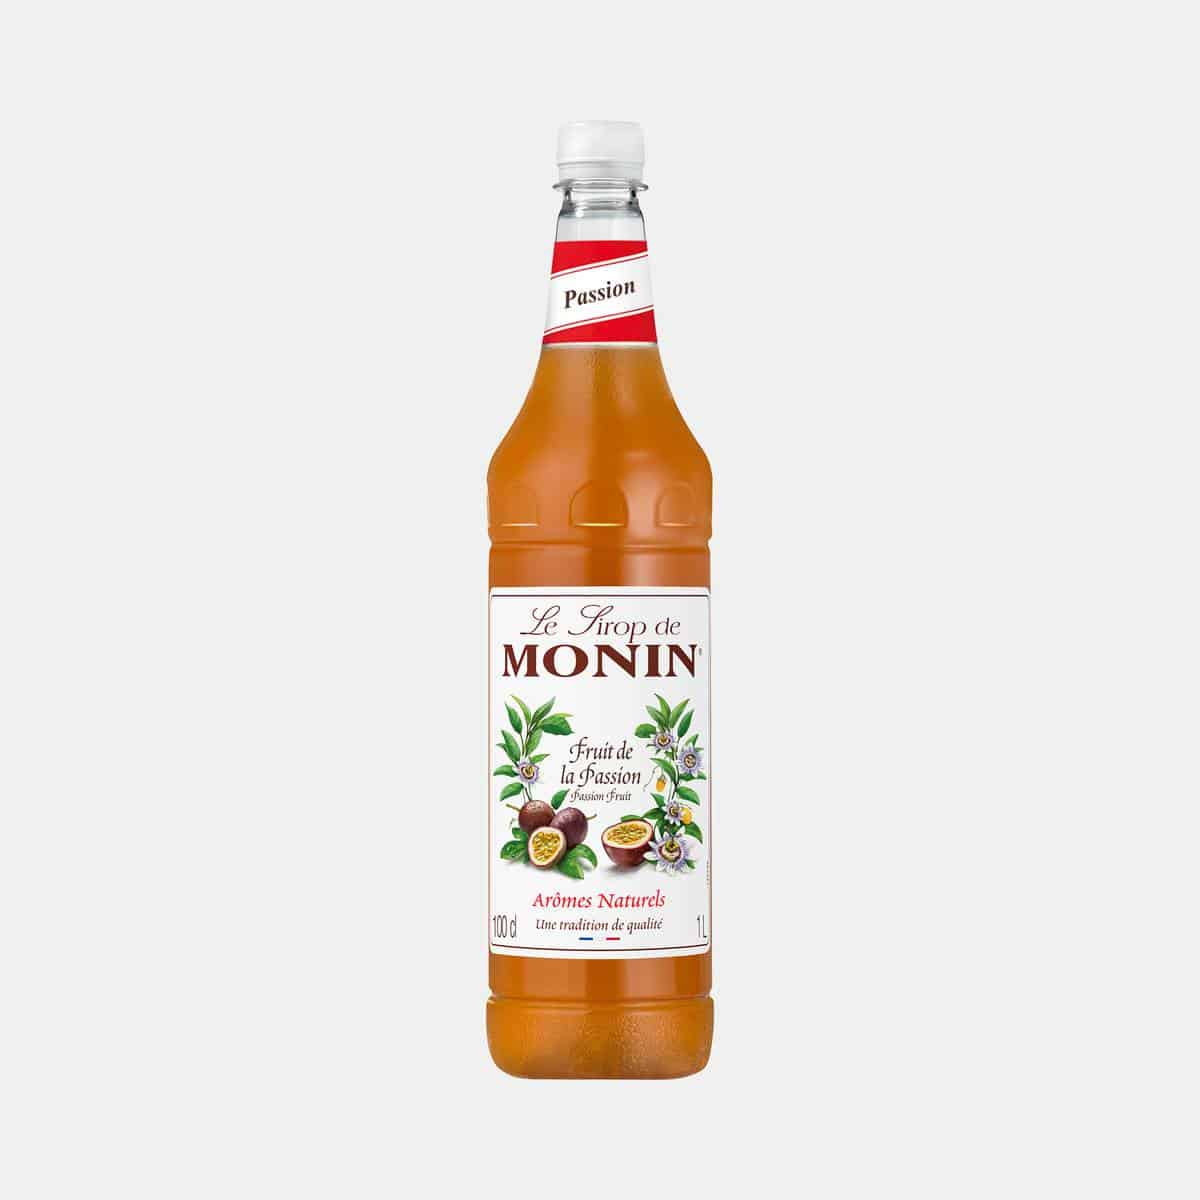 Monin Passion Fruit Syrup 1 Liter PET